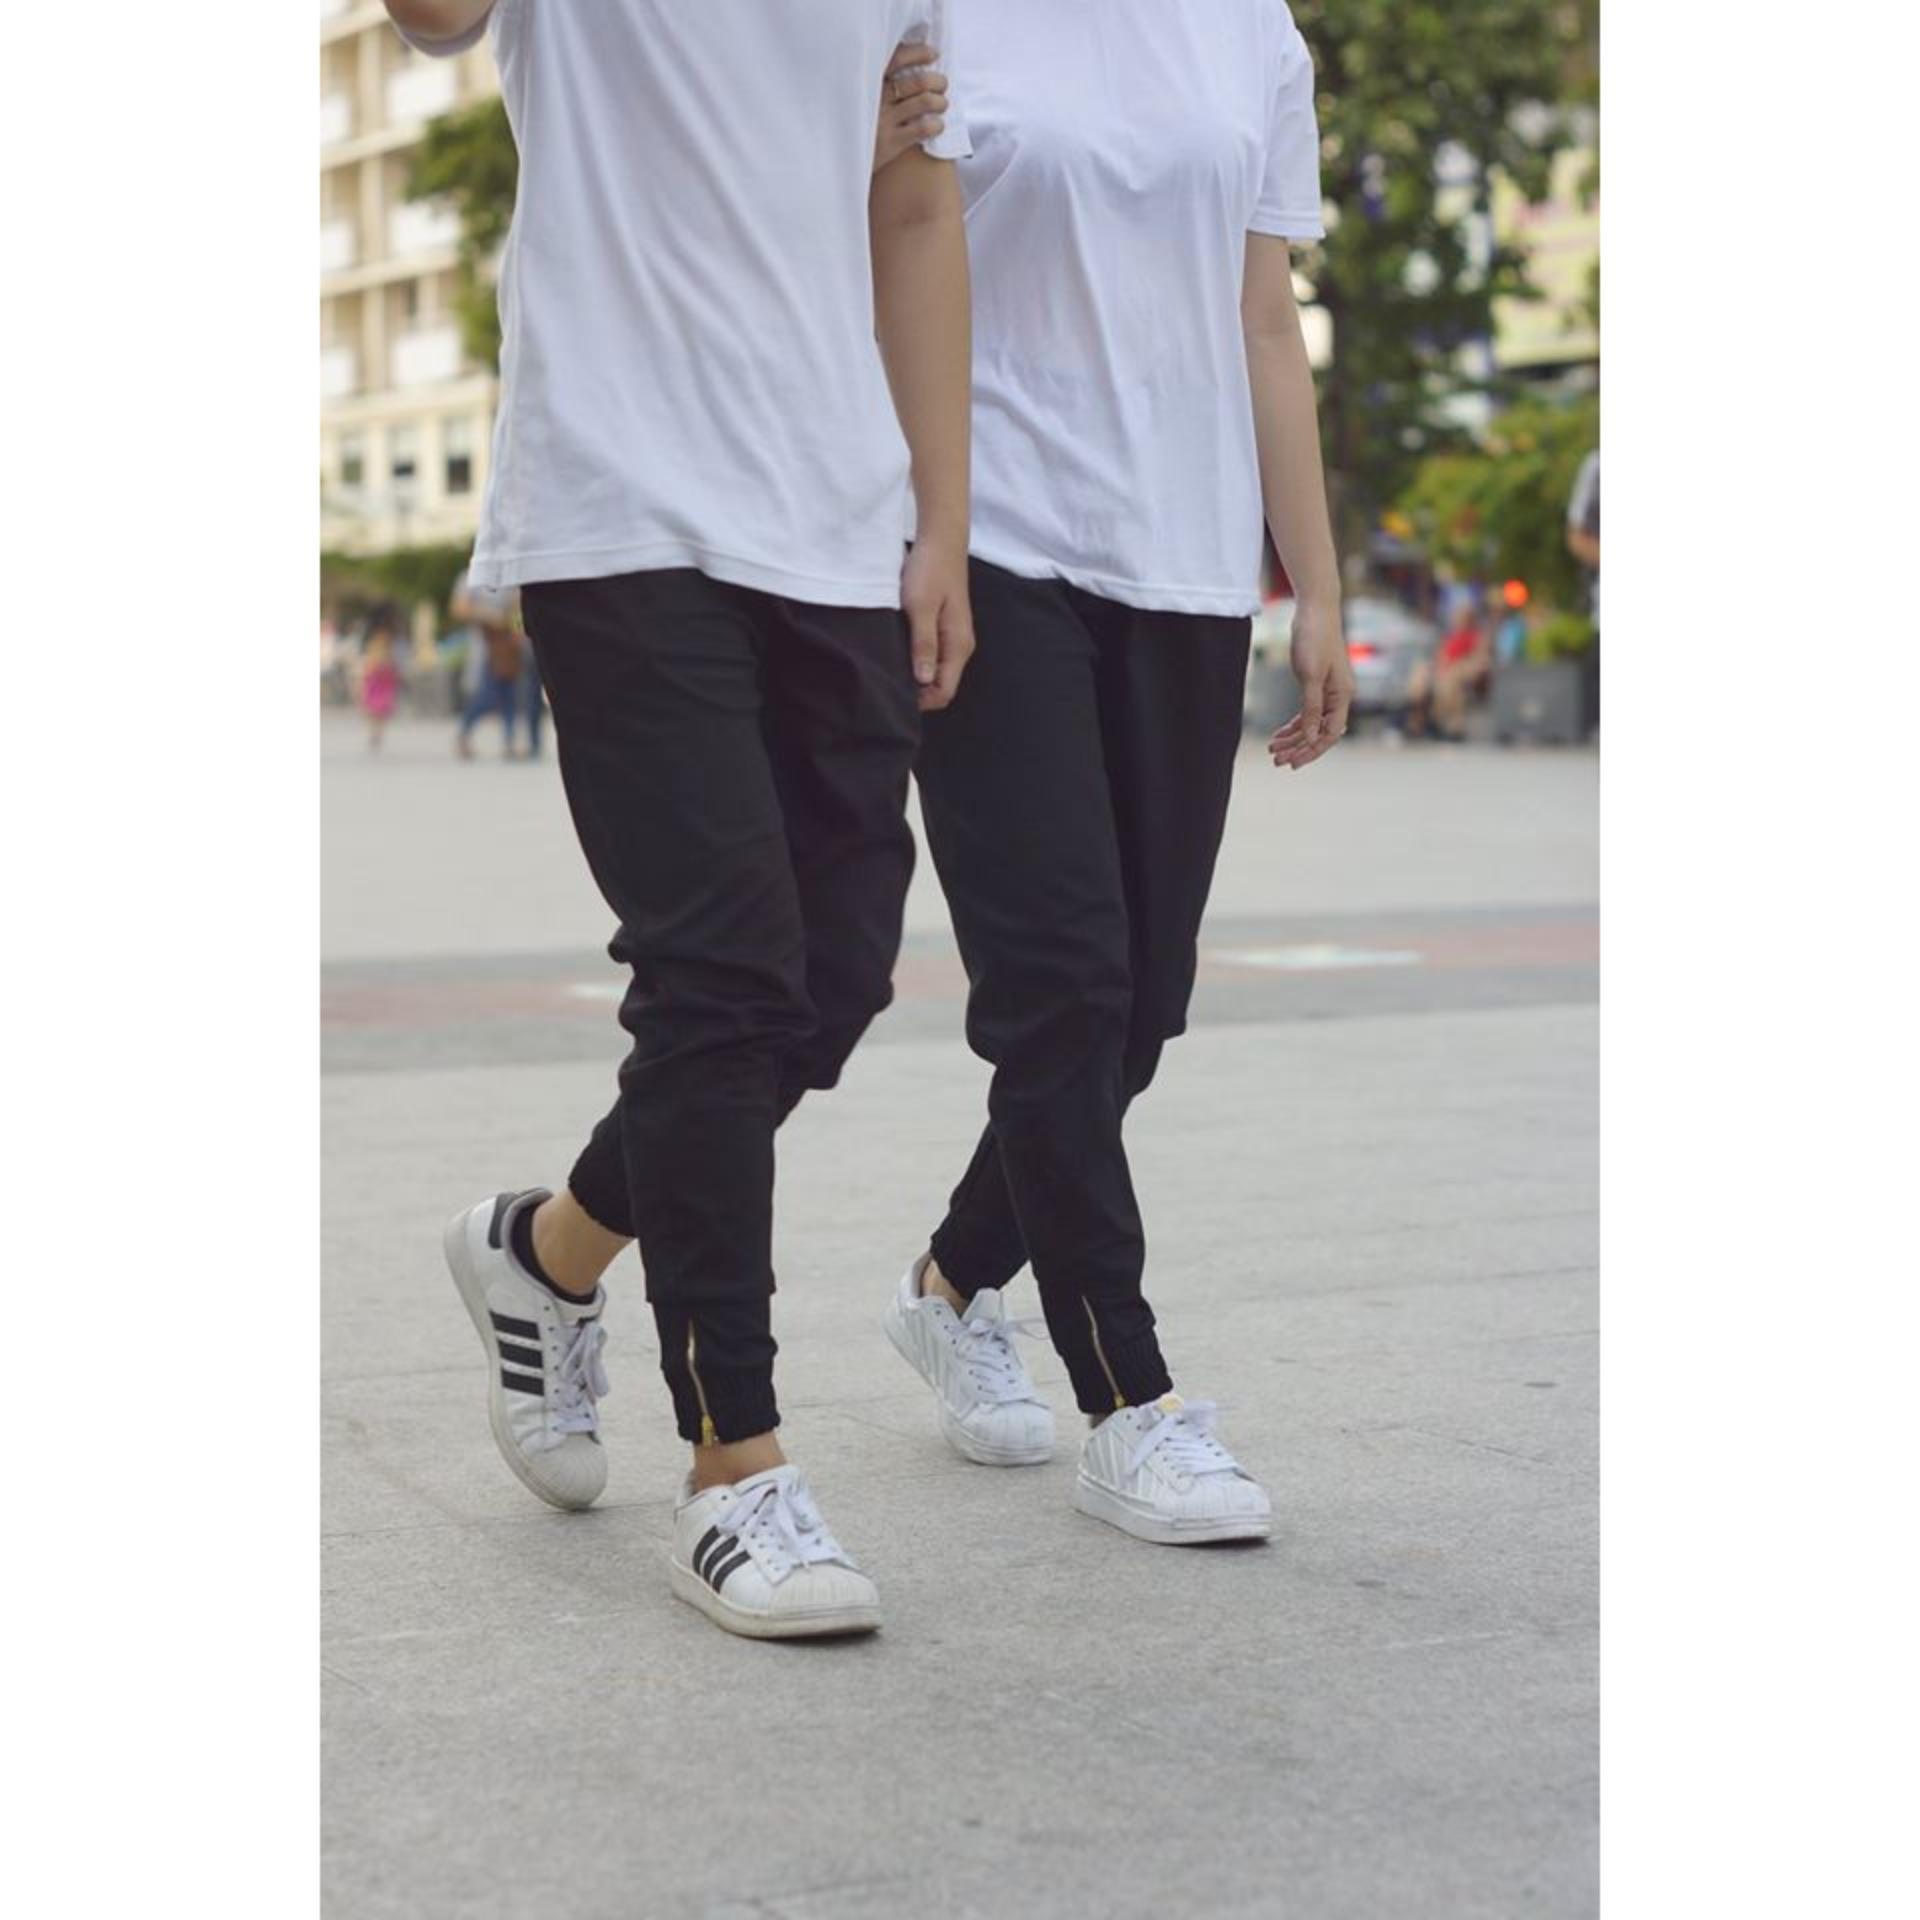 Quần jogger kaki khóa zip nam